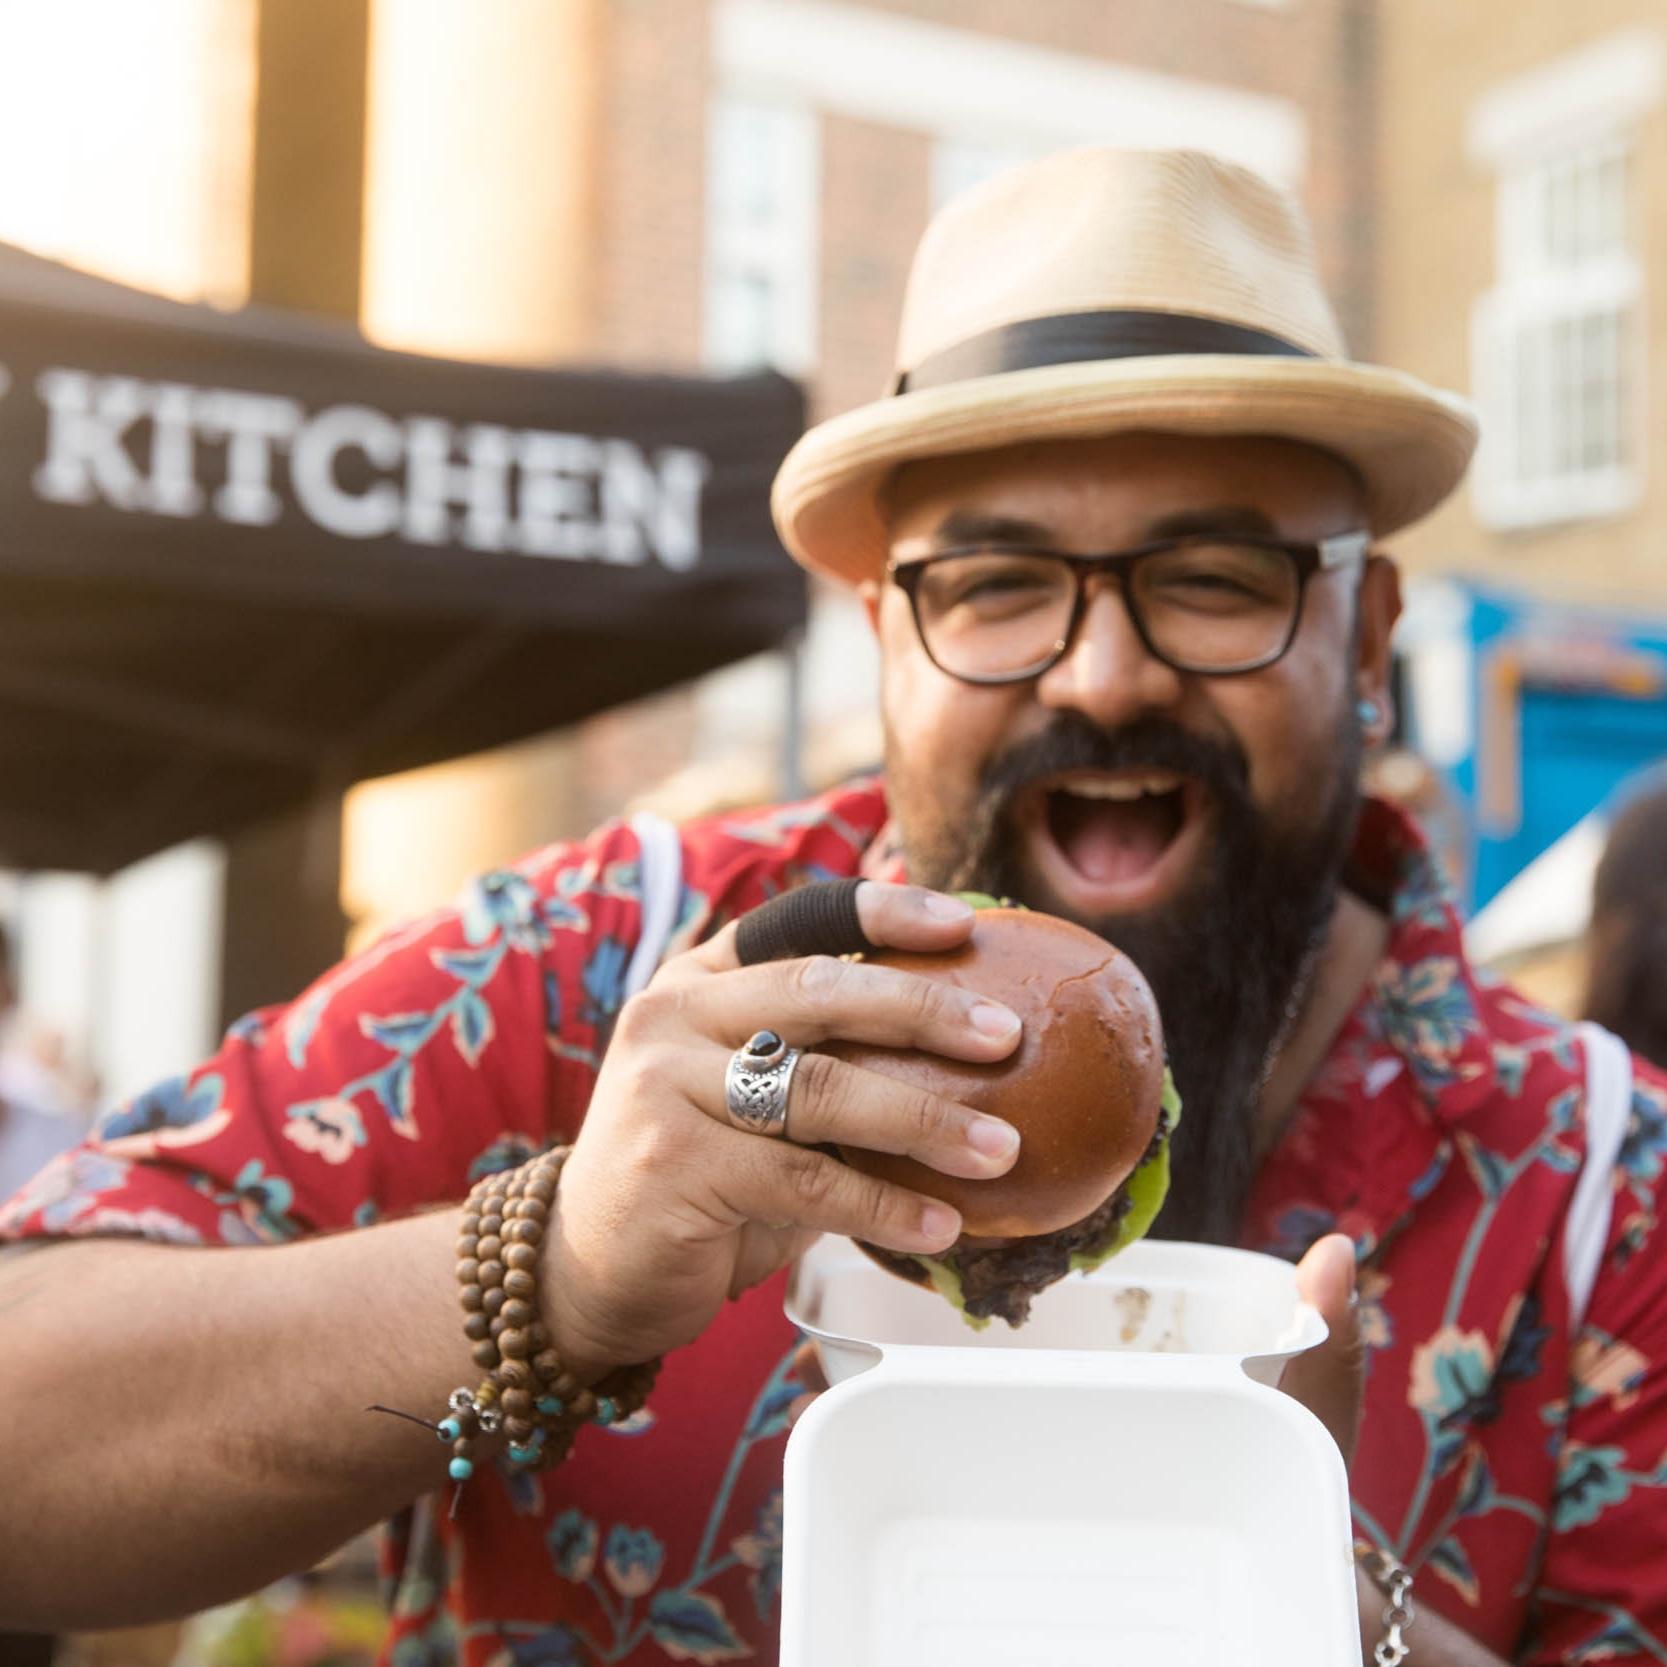 London Bridge Open Kitchen 18 - June 2018